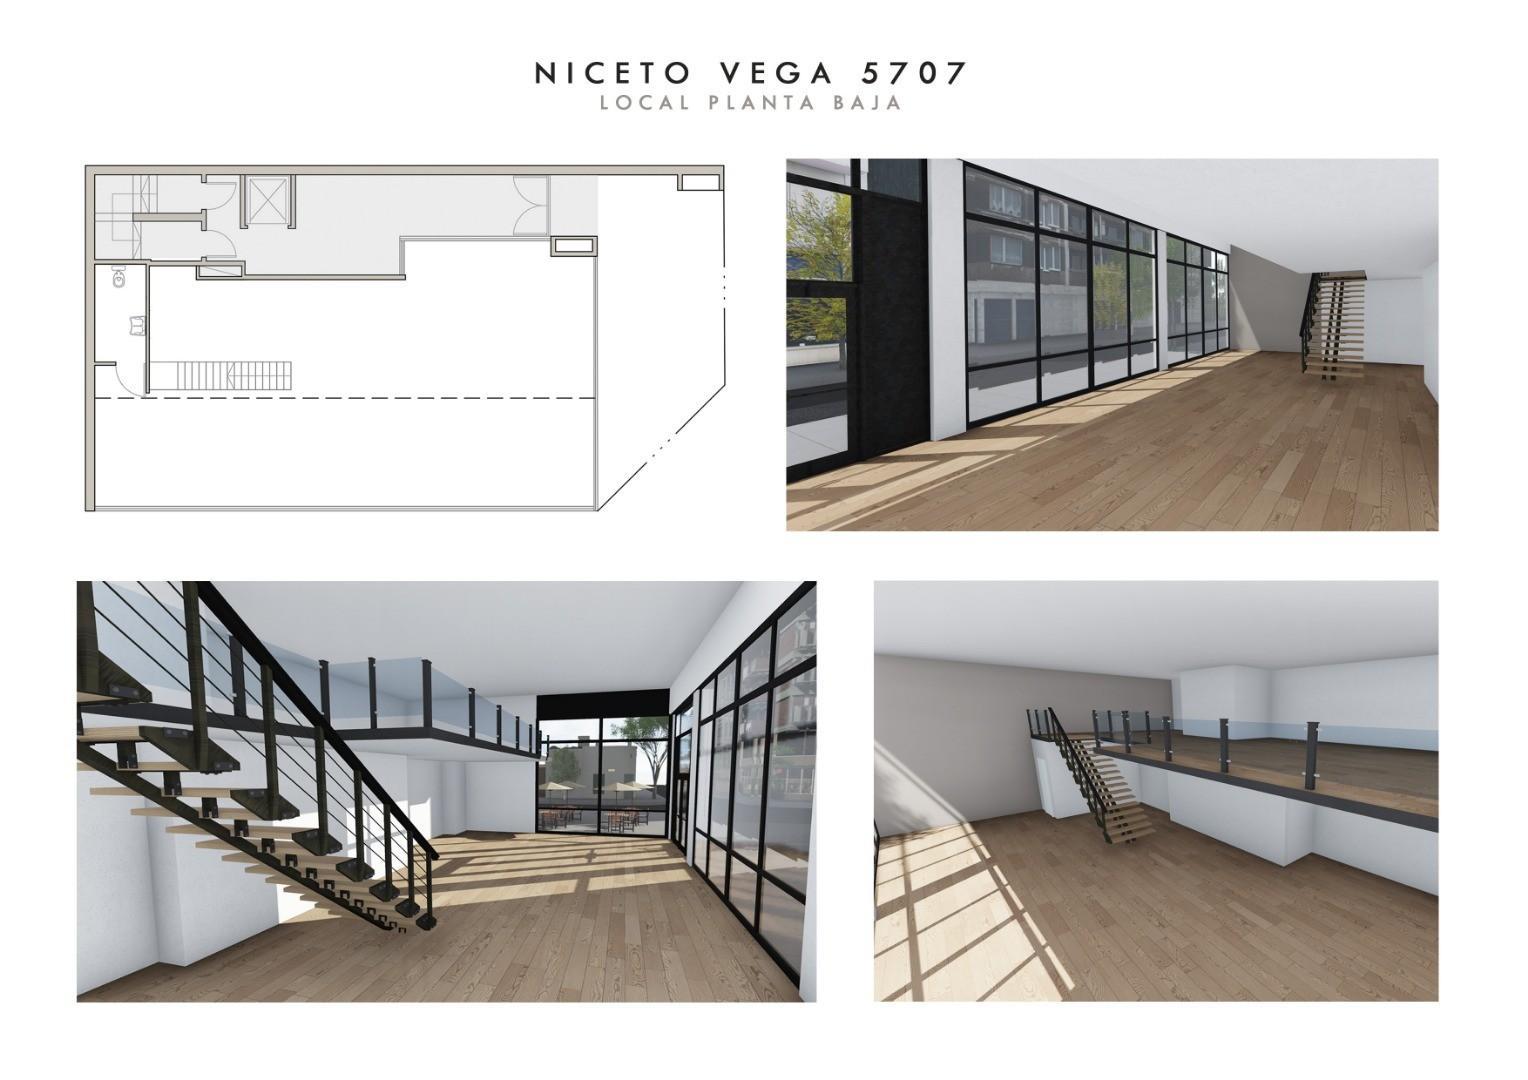 Cnel N Vega 5700